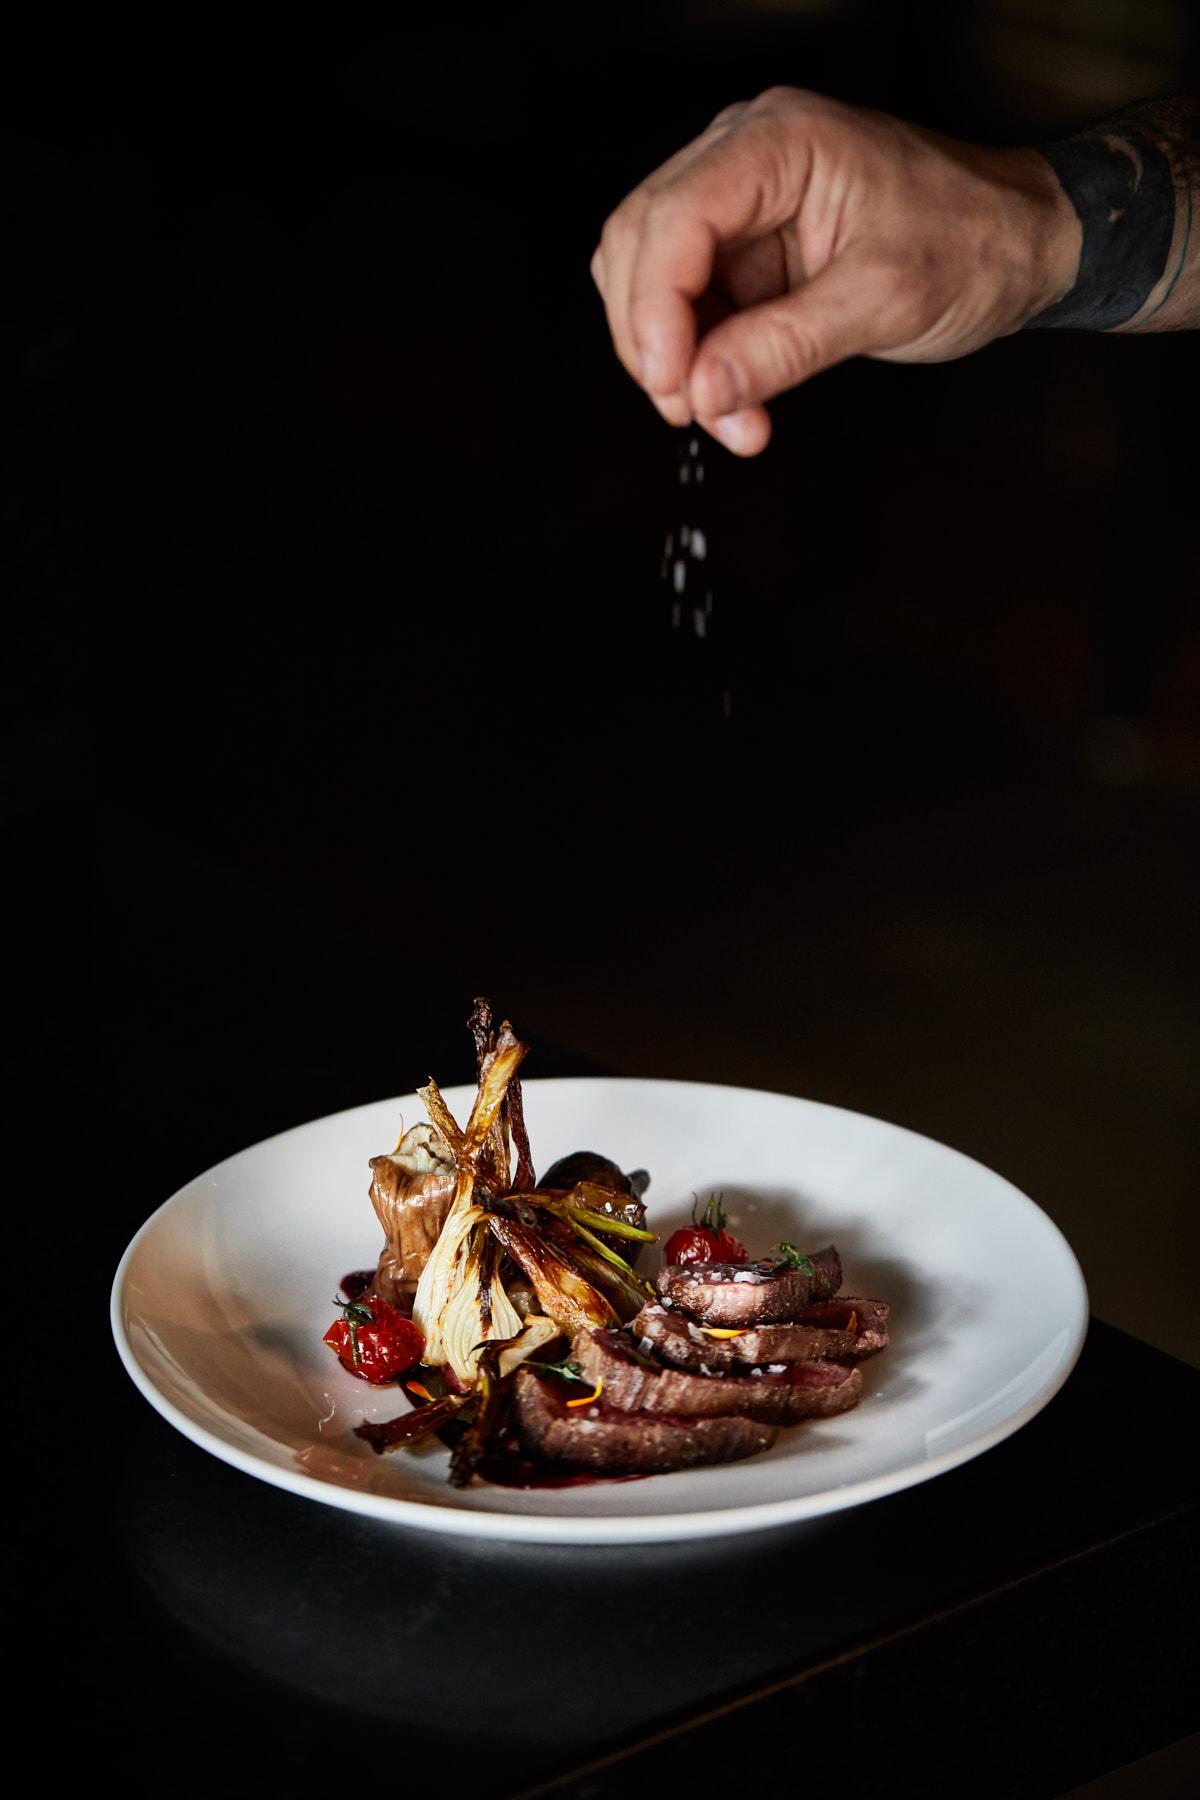 Jody Horton snaps a photo of a hand sprinkling salt on a finished dish